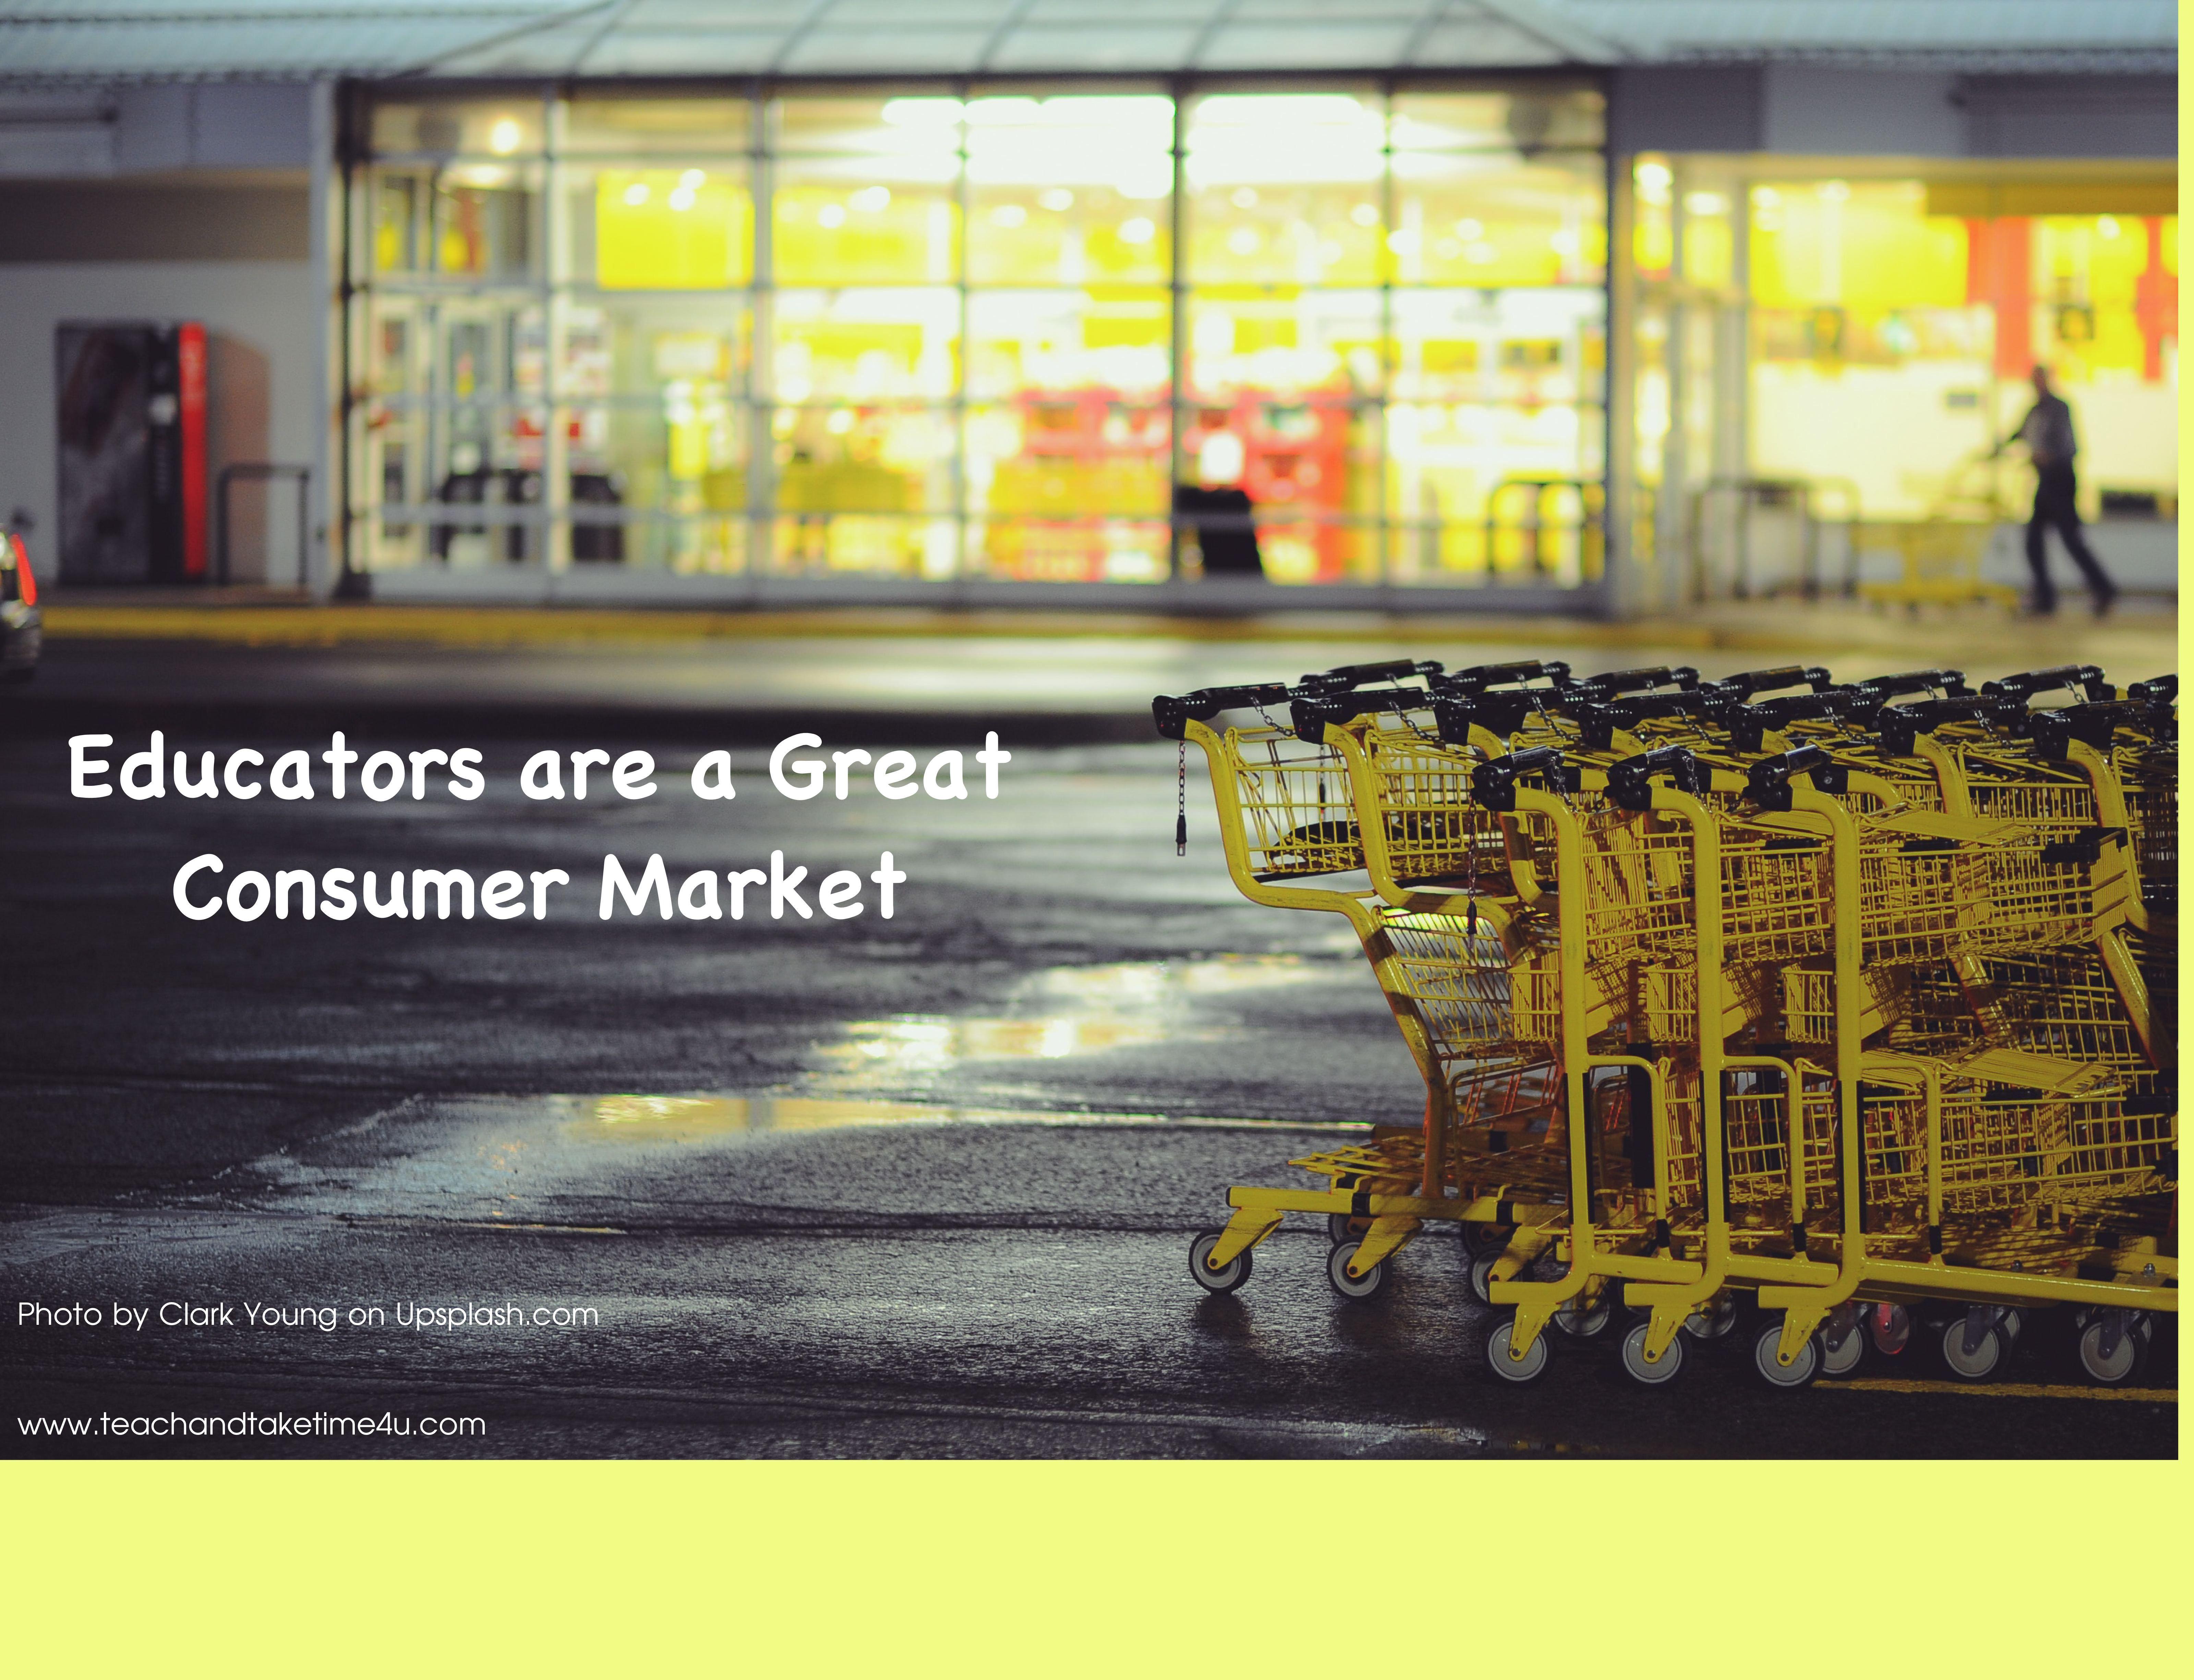 Educators are a Great Consumer Market Consumer marketing